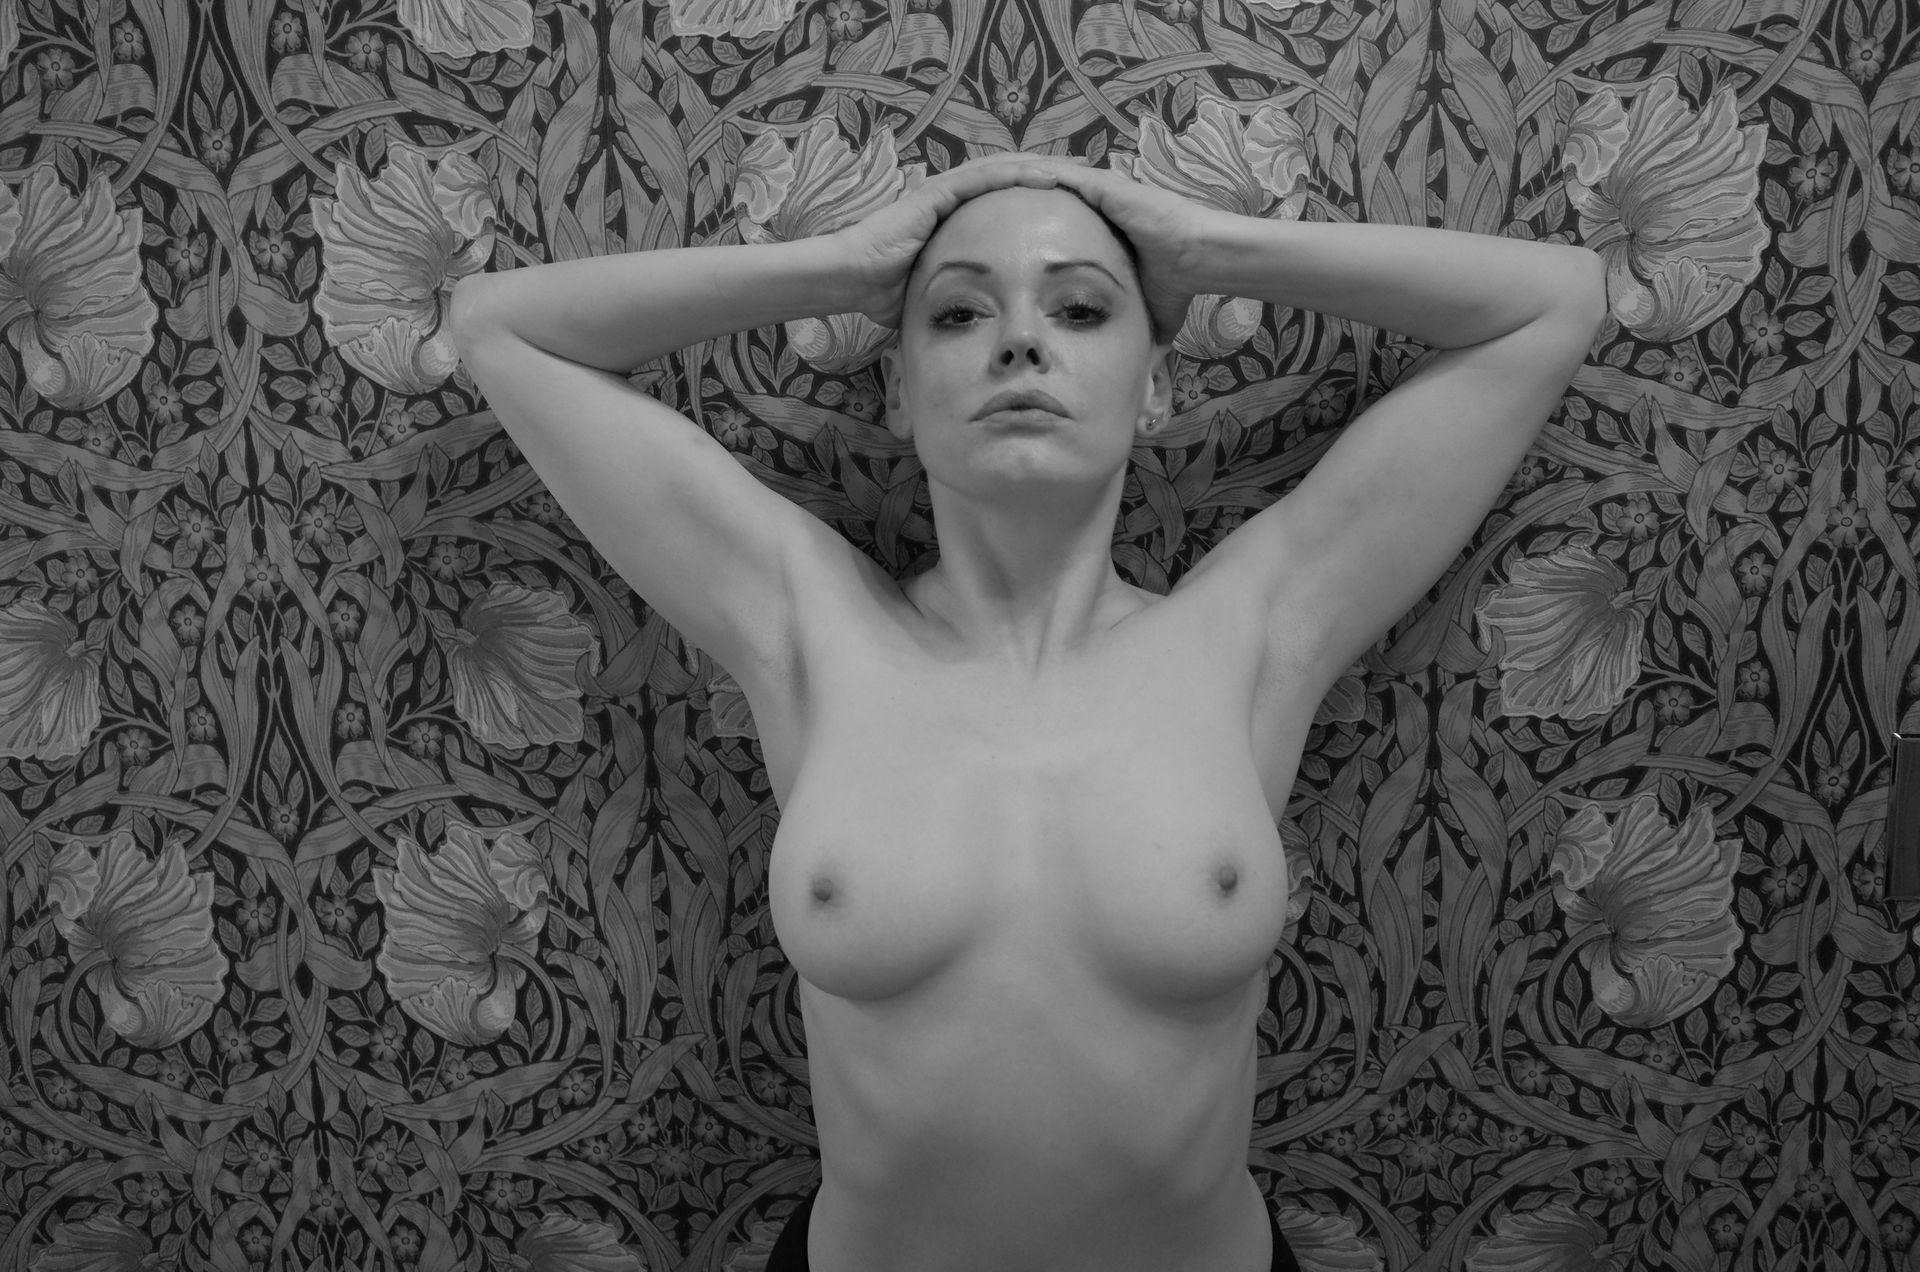 Rose mcgowan nude pics vids